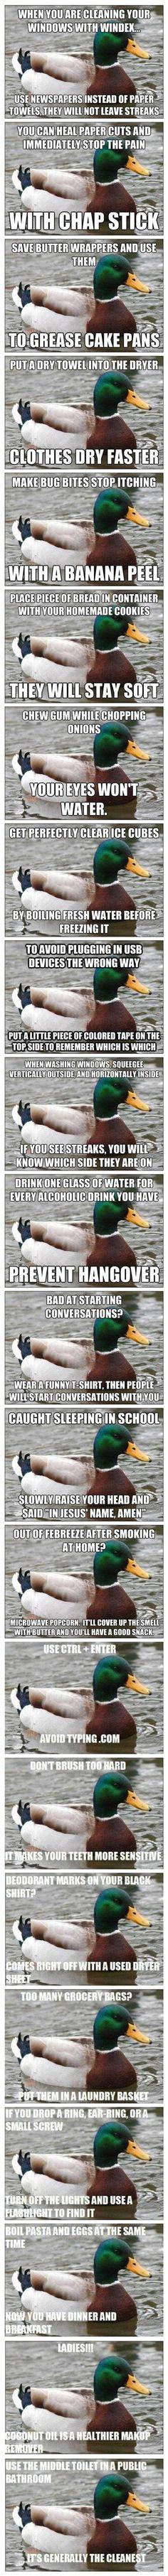 Dump A Day Funny Advice From Mallard Meme - 24 Pics